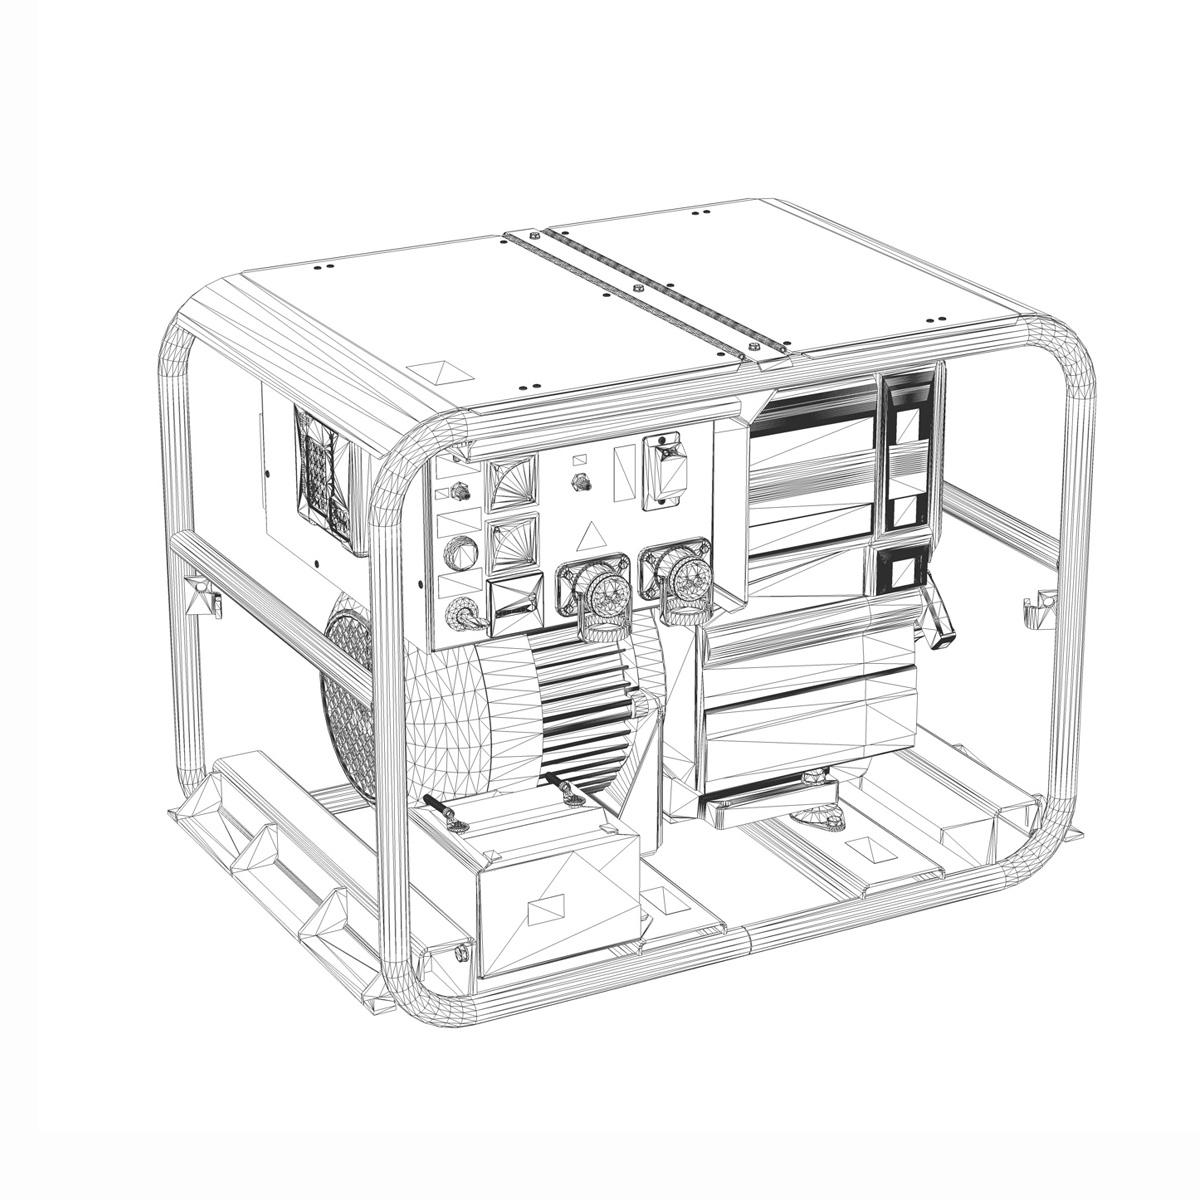 military diesel generator 3d model 3ds fbx c4d lwo obj 188564